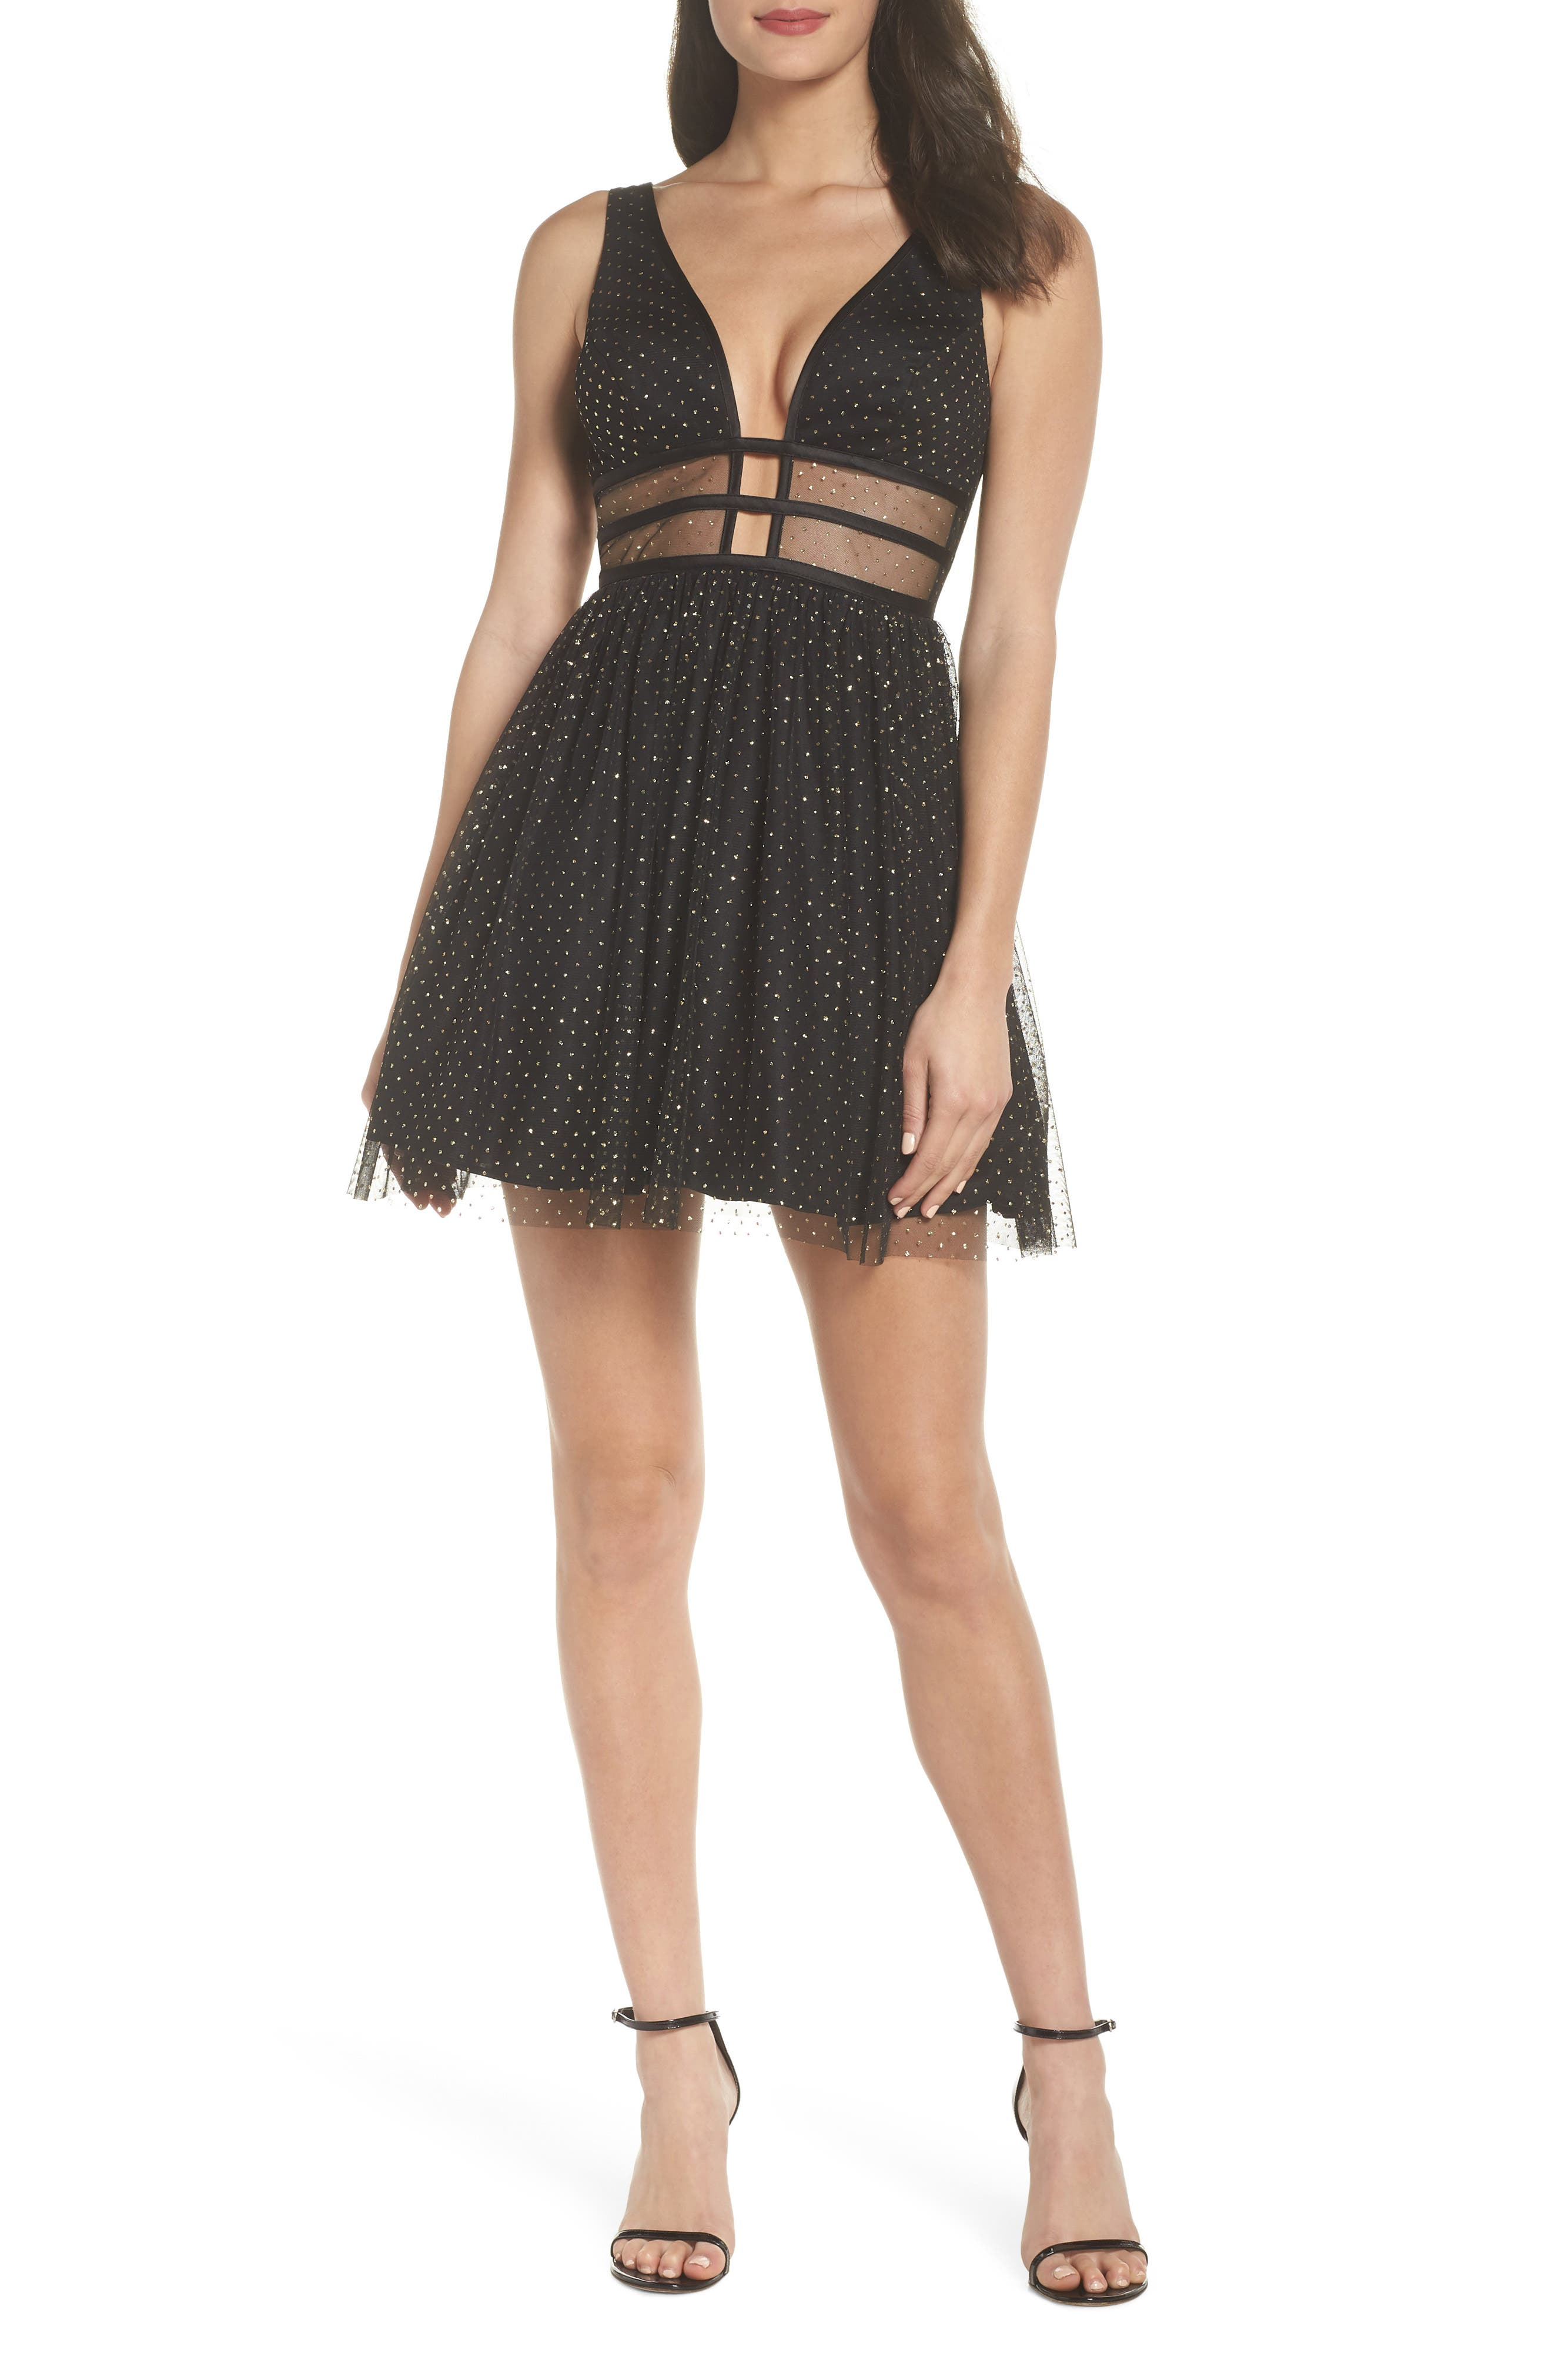 Blondie Nites Glitter Dot Fit & Flare Party Dress, Black